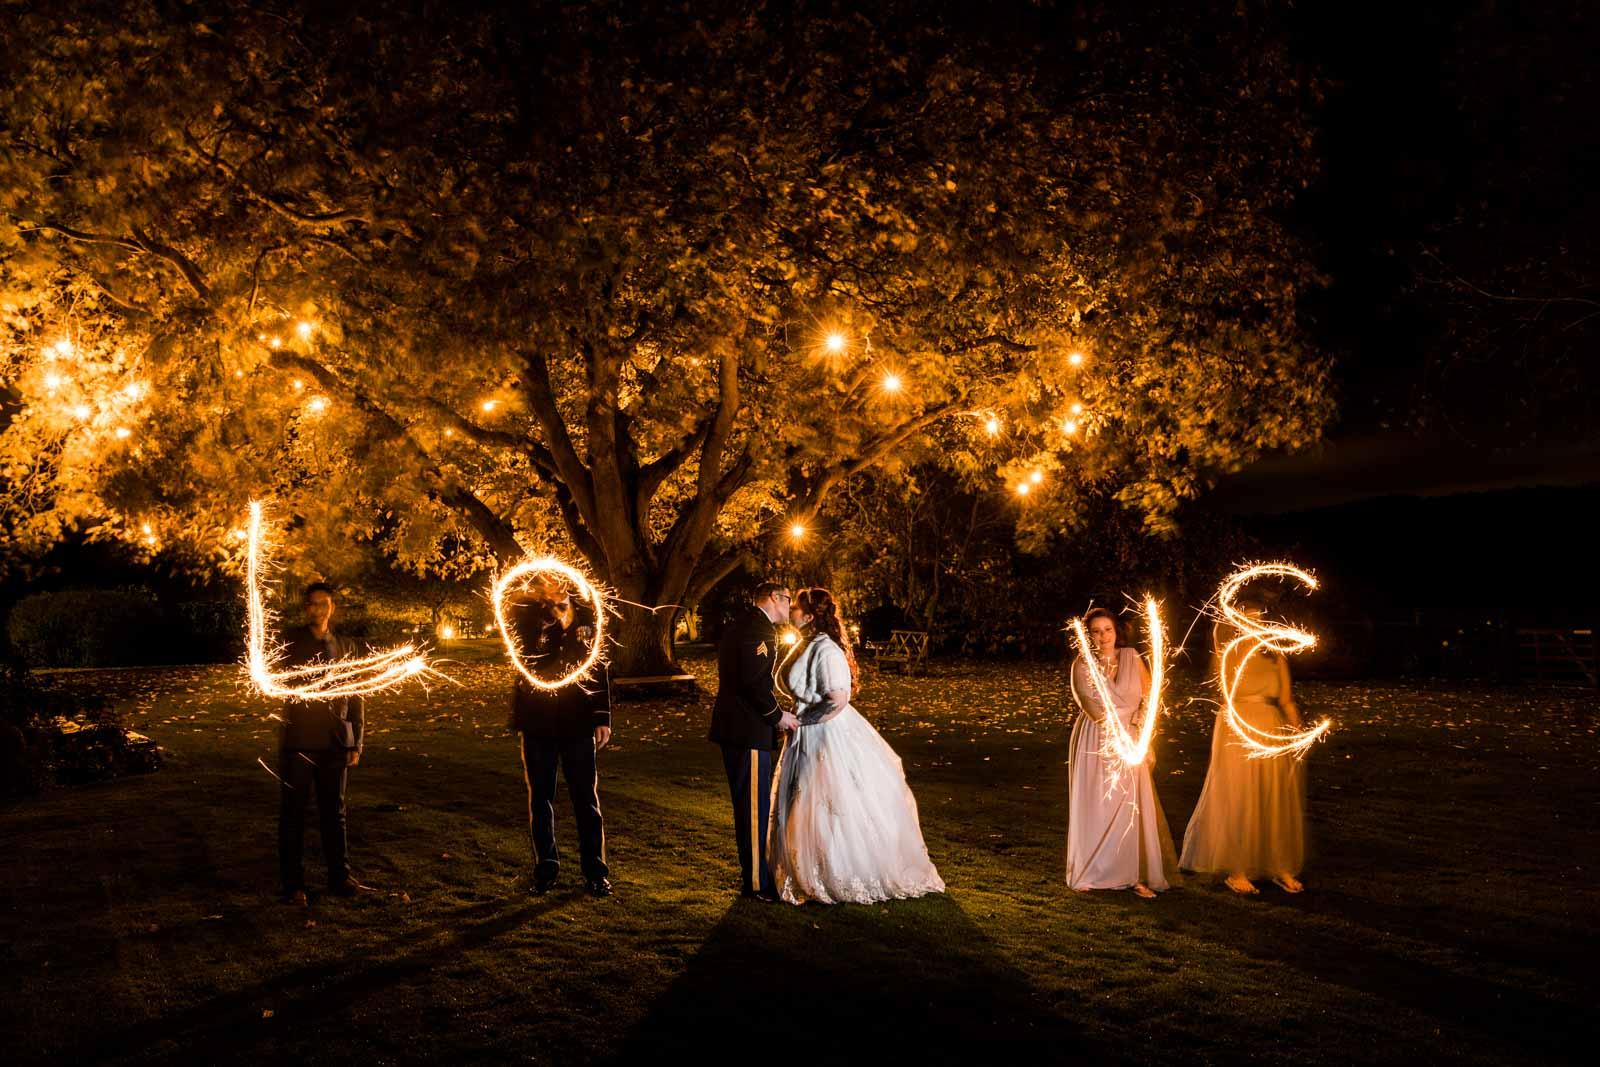 Great wedding sparkler ideas taken at Crockwell Farm